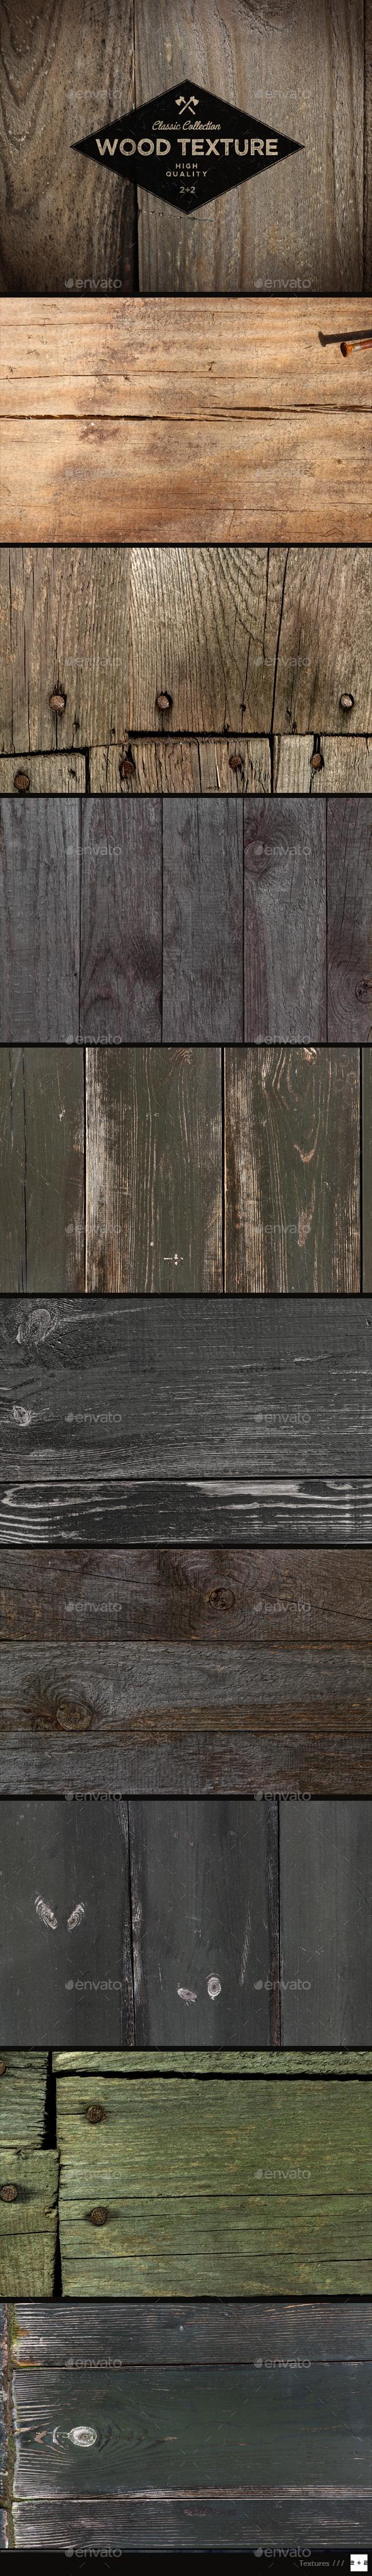 10 Old Wood Textures - Wood Textures